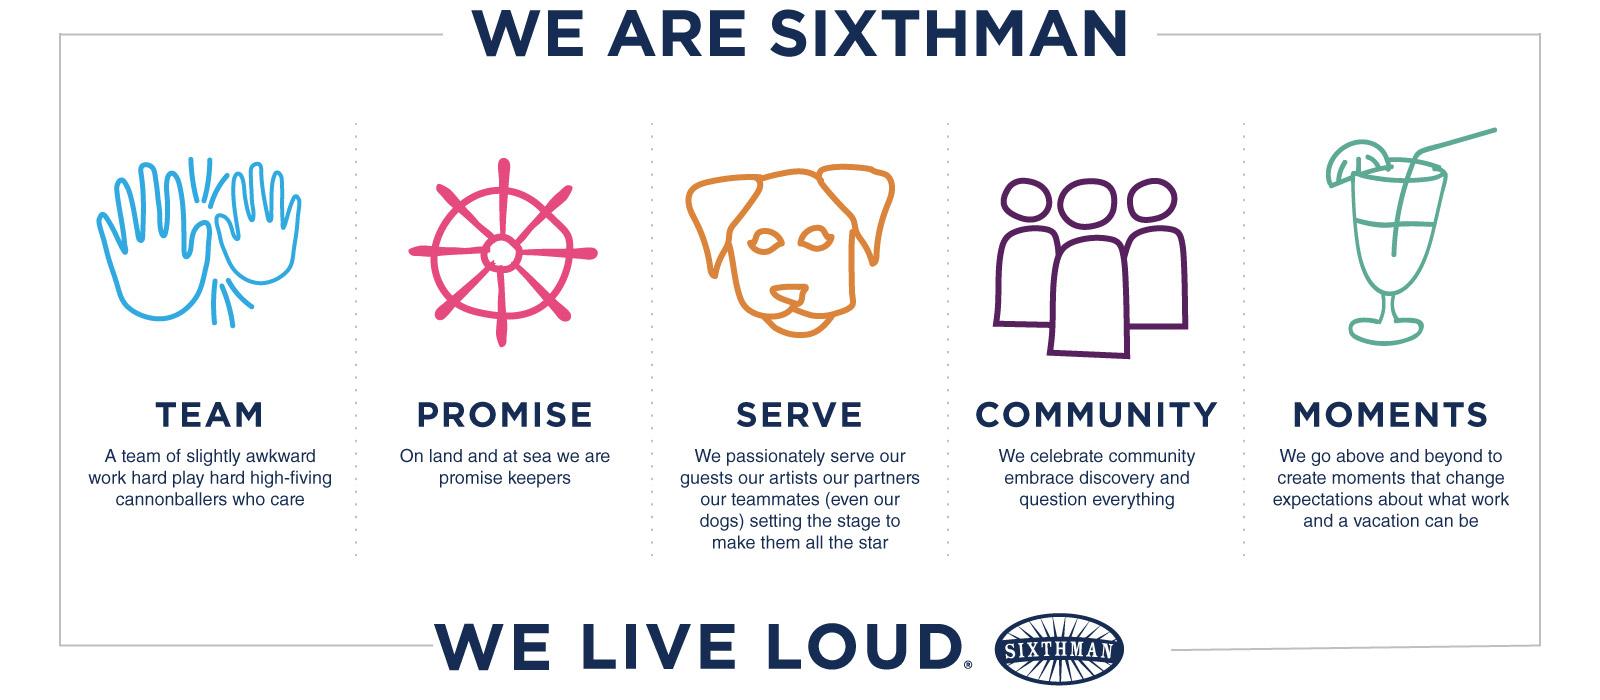 Sixthman Values